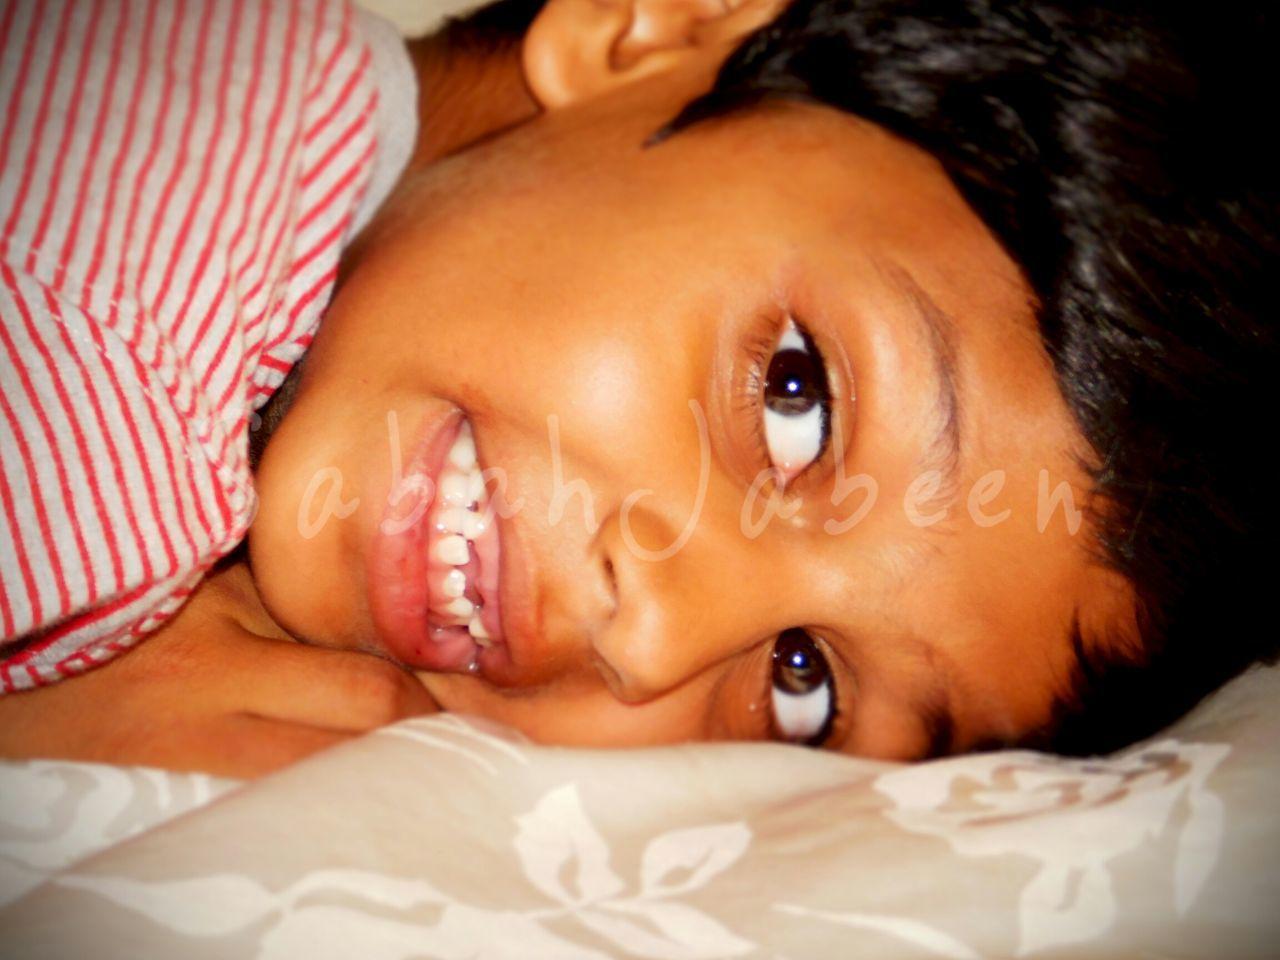 Potrait Potrait_photography Children Photography Relaxing Taking Photos Sweet Love Closeupshot Closeup Boy